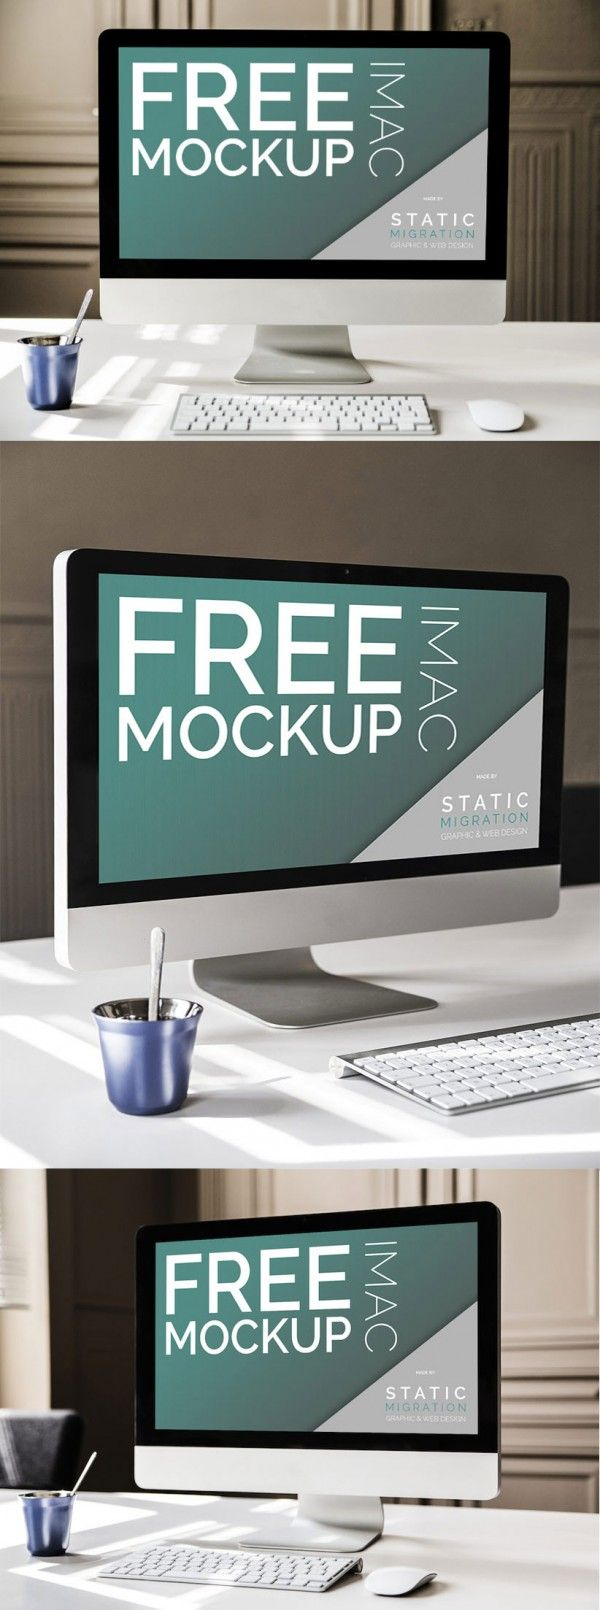 Free Imac Mock ups Psd